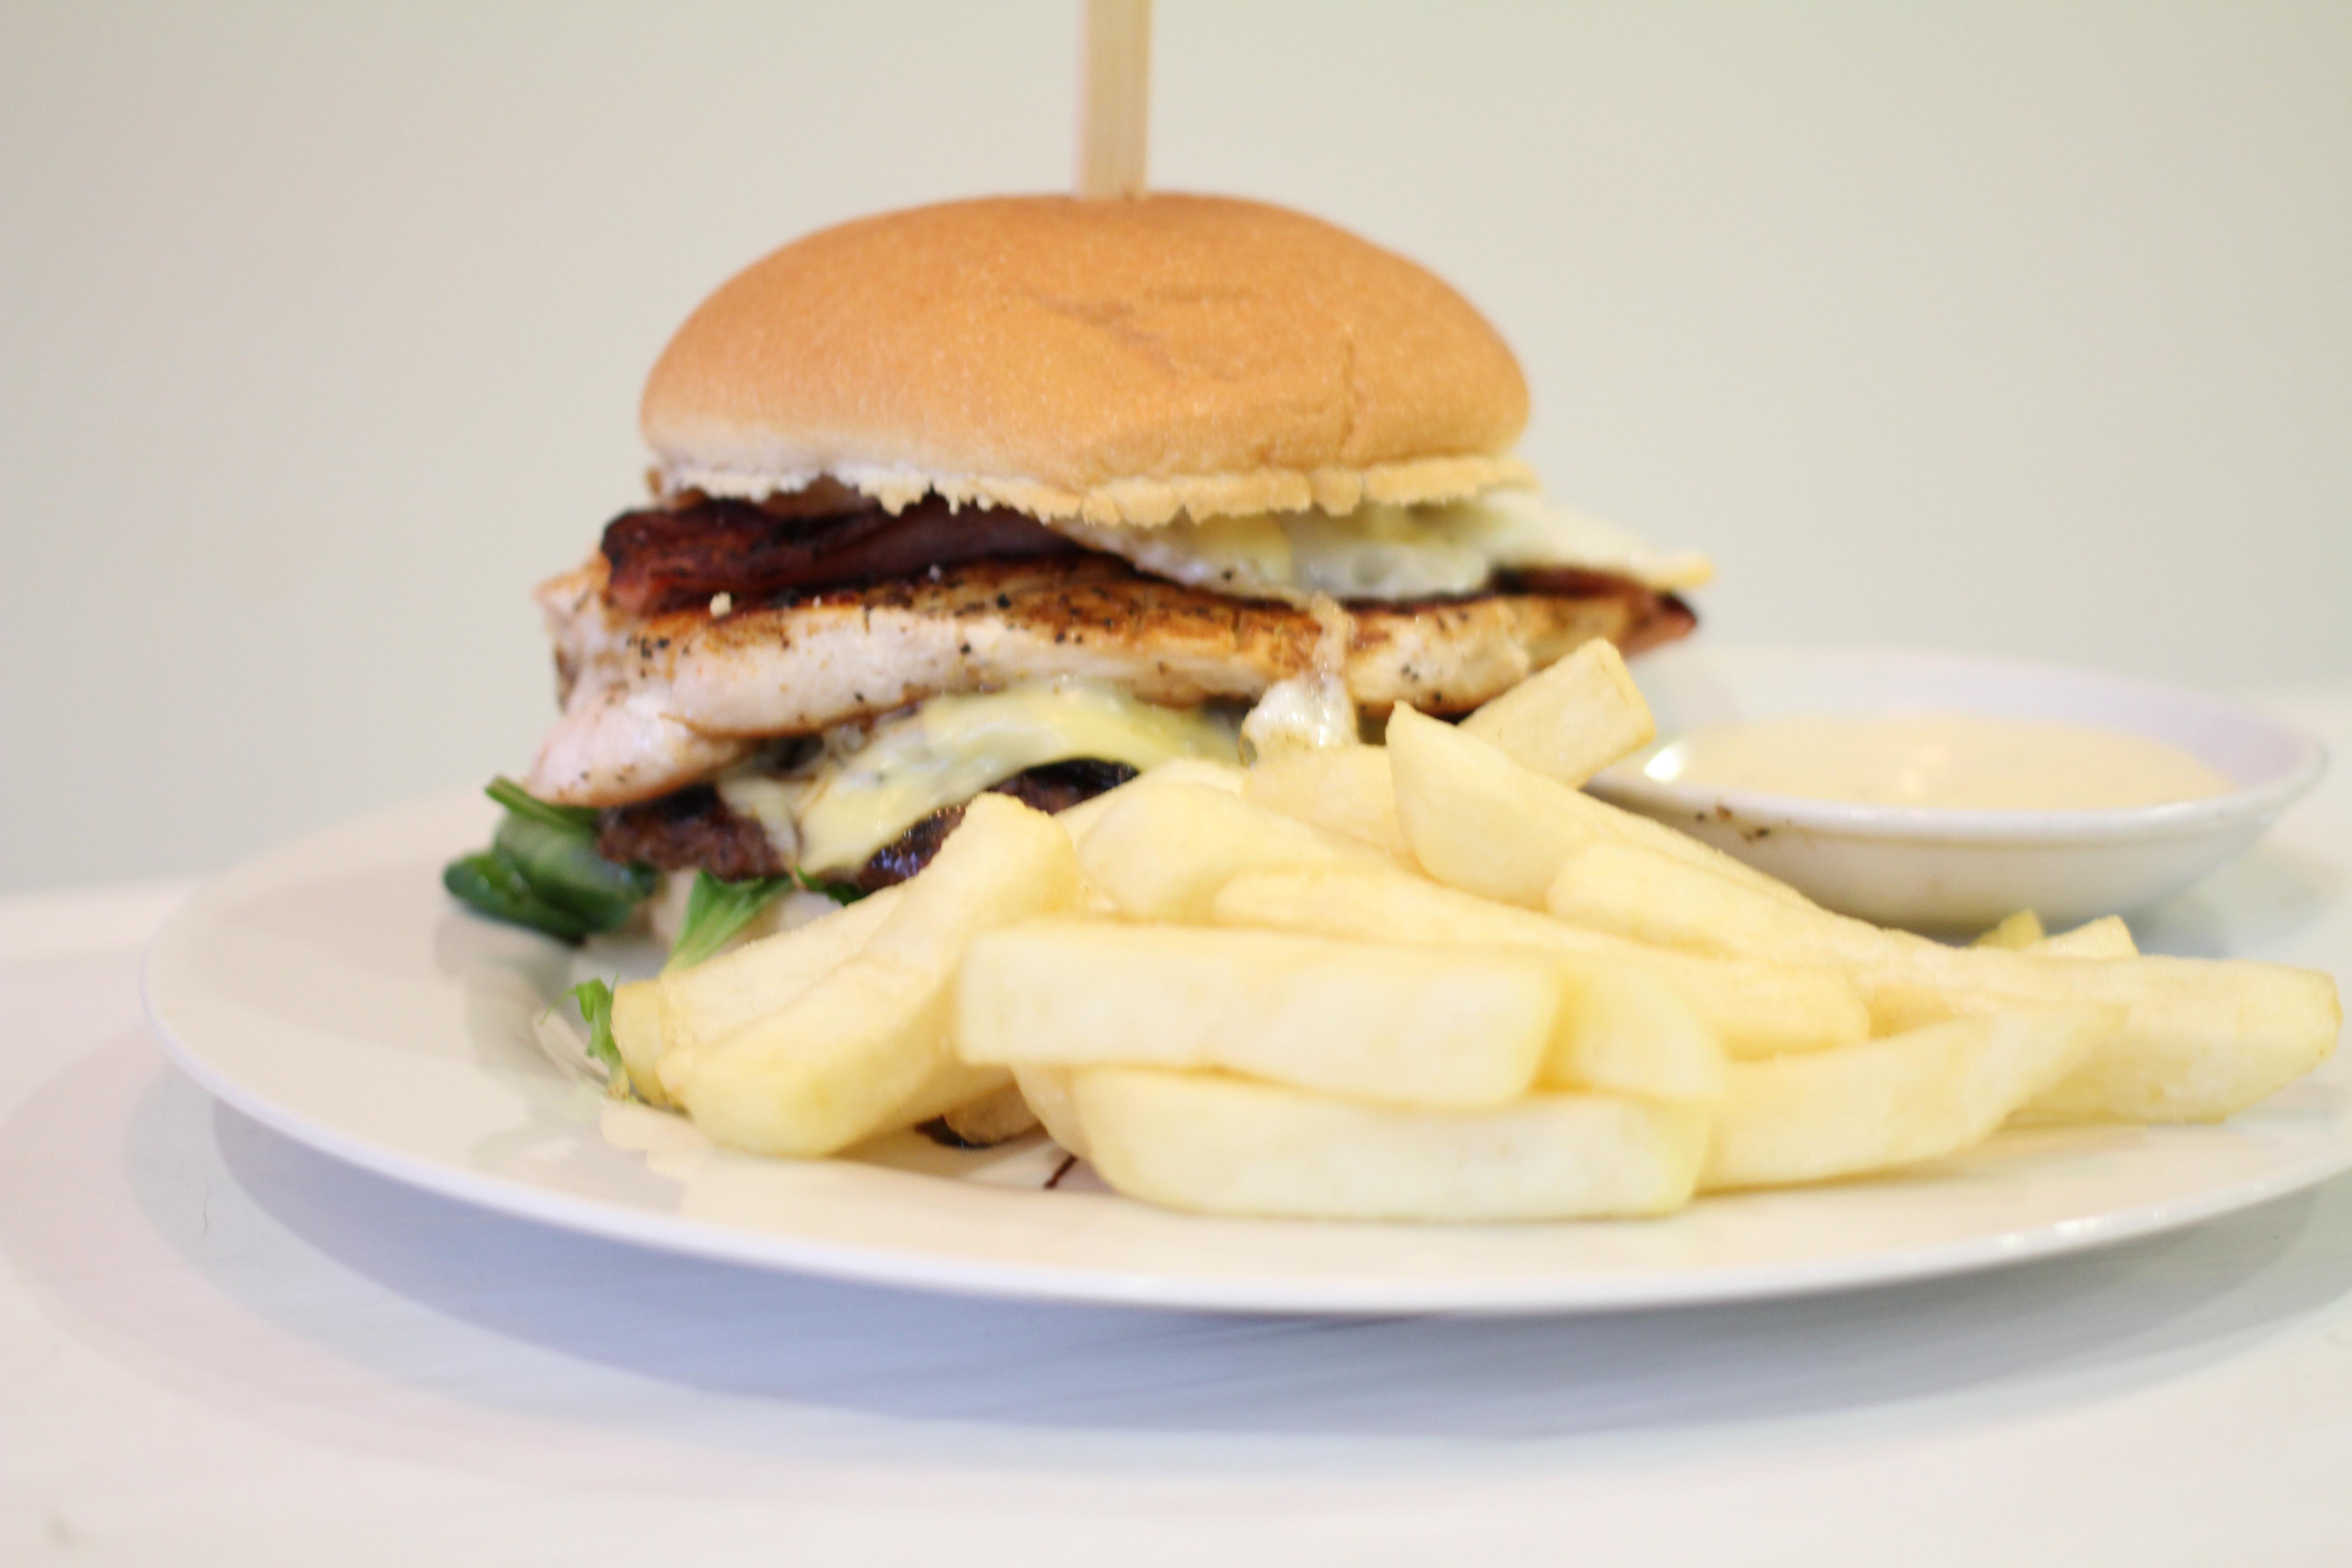 Ultra Tyranno burger